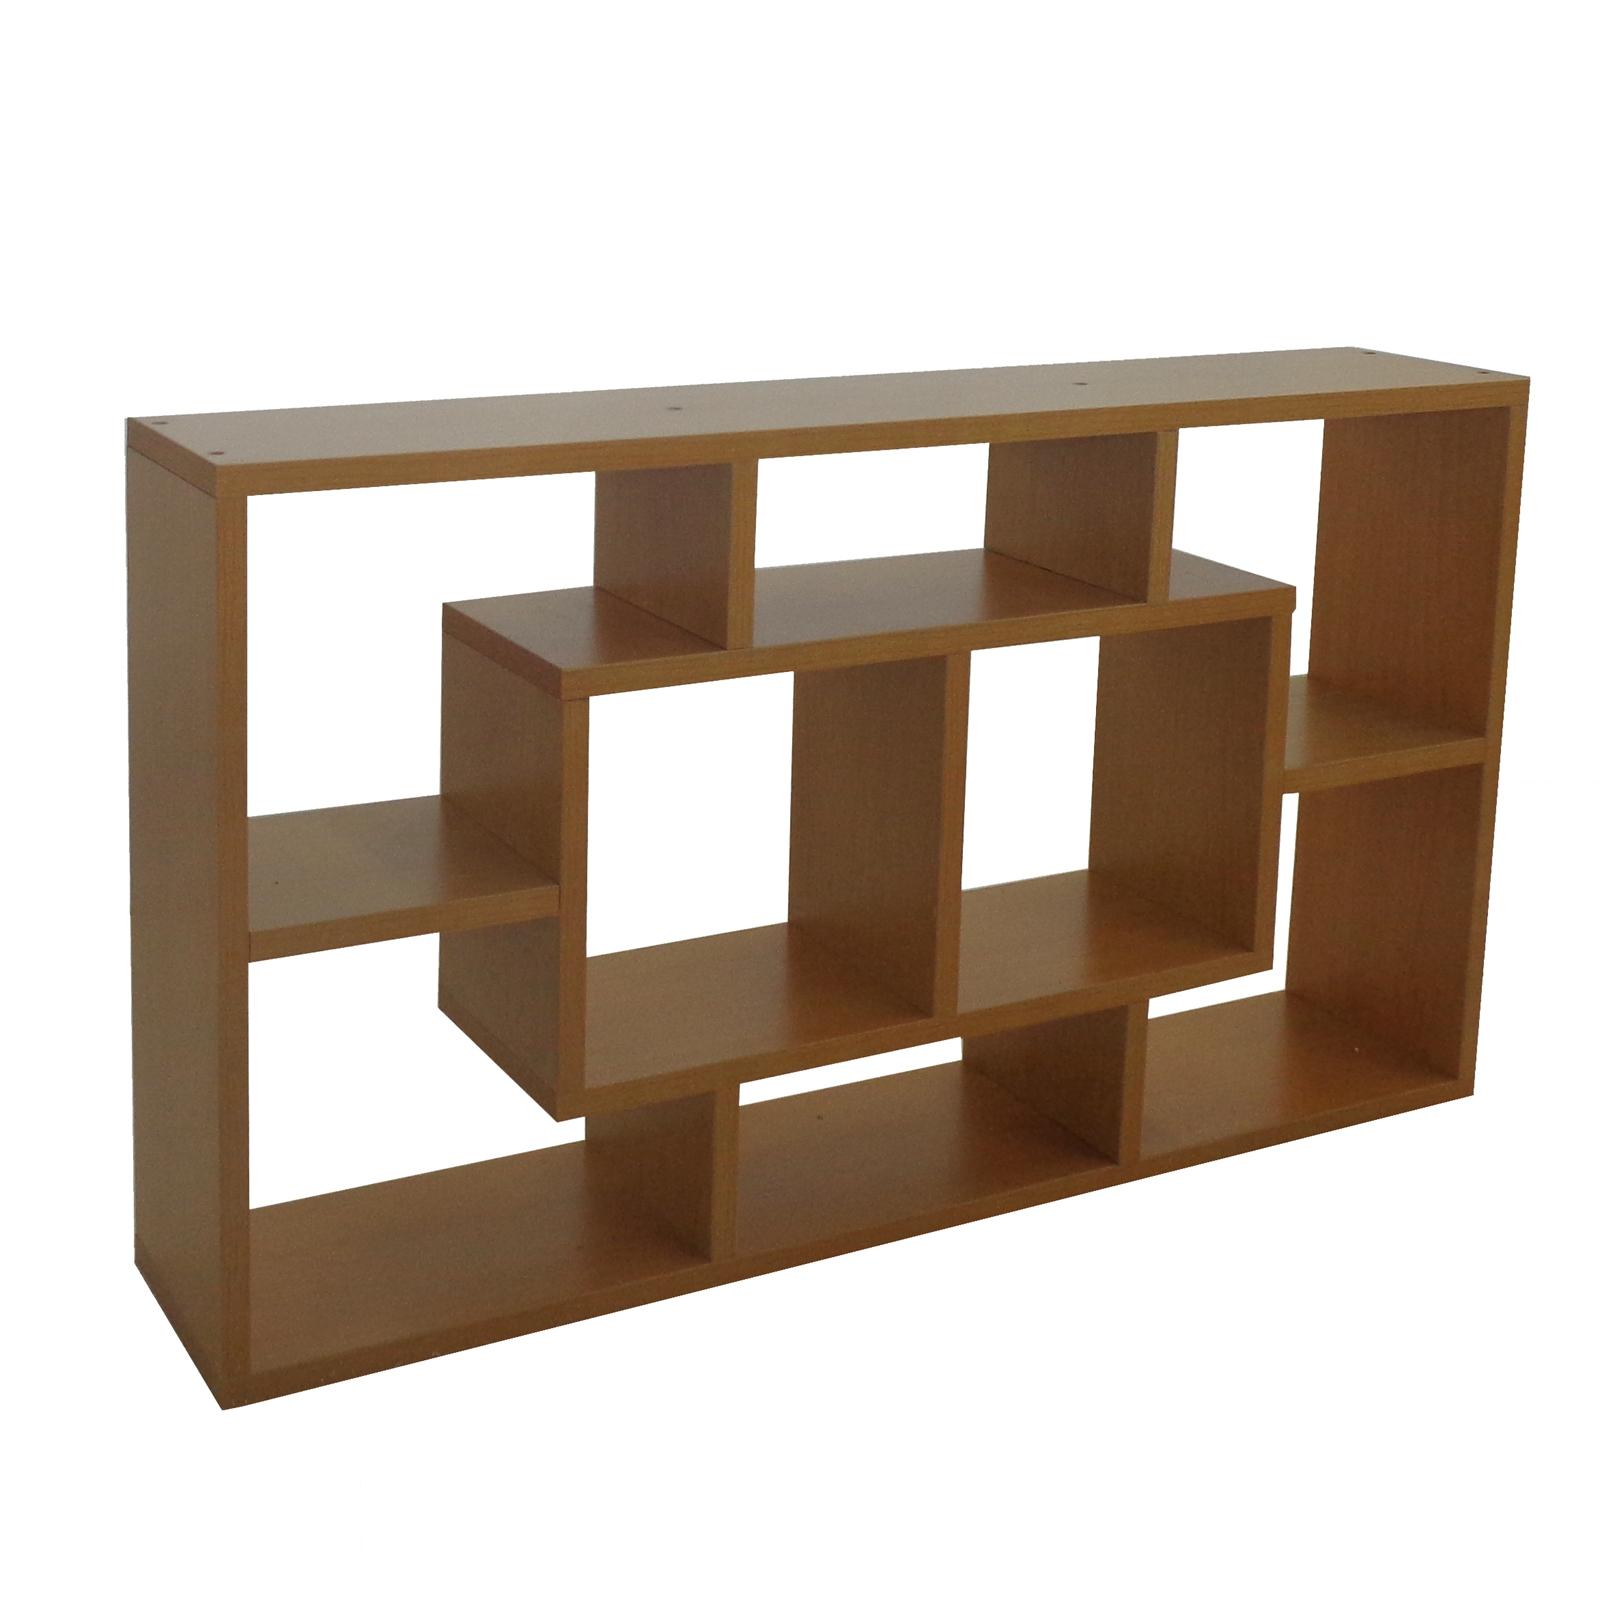 FoxHunter Beech Wood Decor Shelf Display Storage Unit